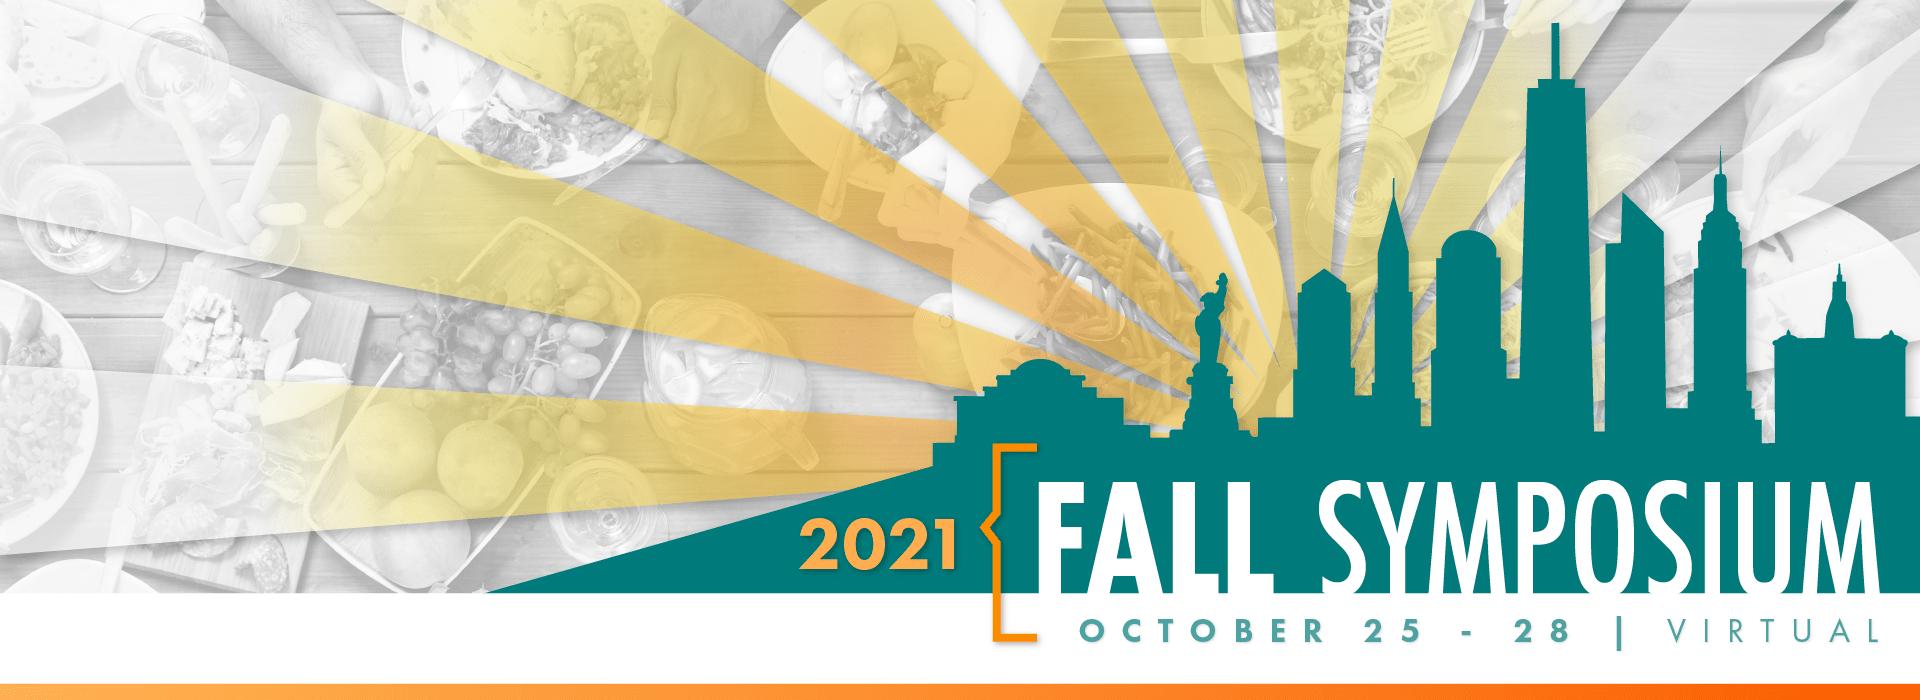 2021 Fall Symposium - Web Elements_Banner[1]